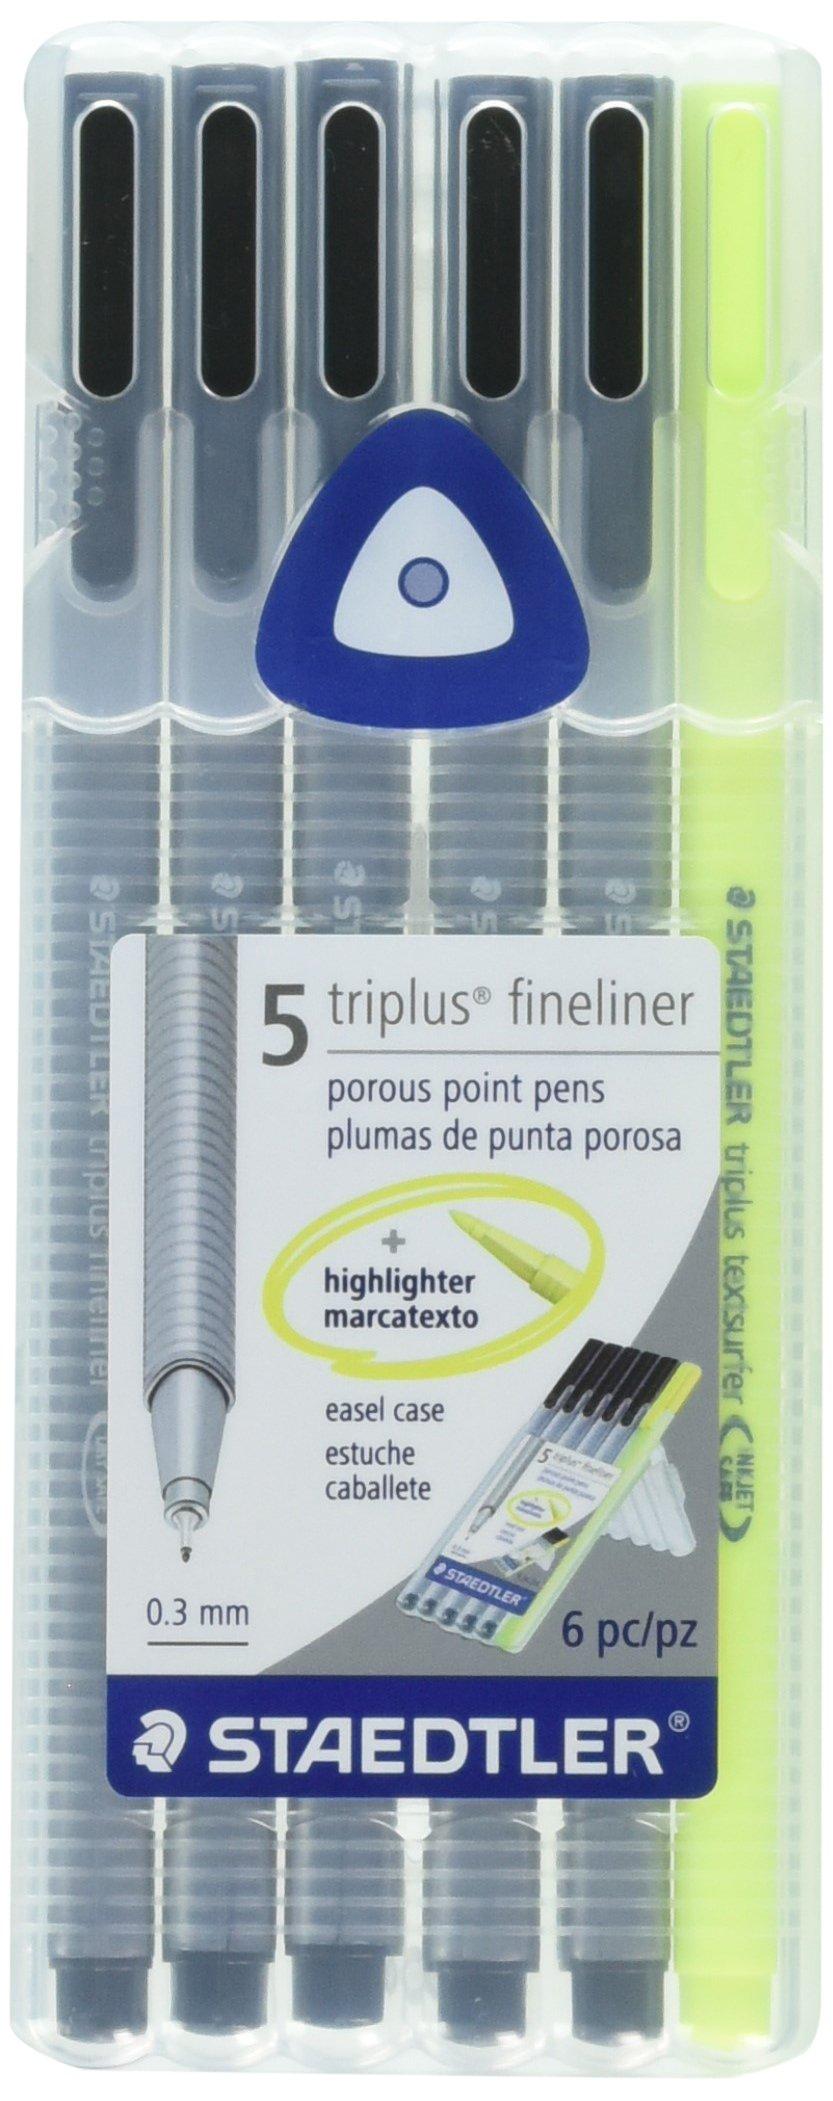 STAEDTLER triplus fineliner BONUS pack, 5 black fineliner pens + FREE highlighter, ergonomic triangular barrel, for writing & highlighting, set of 6, 334-9SB6 by STAEDTLER